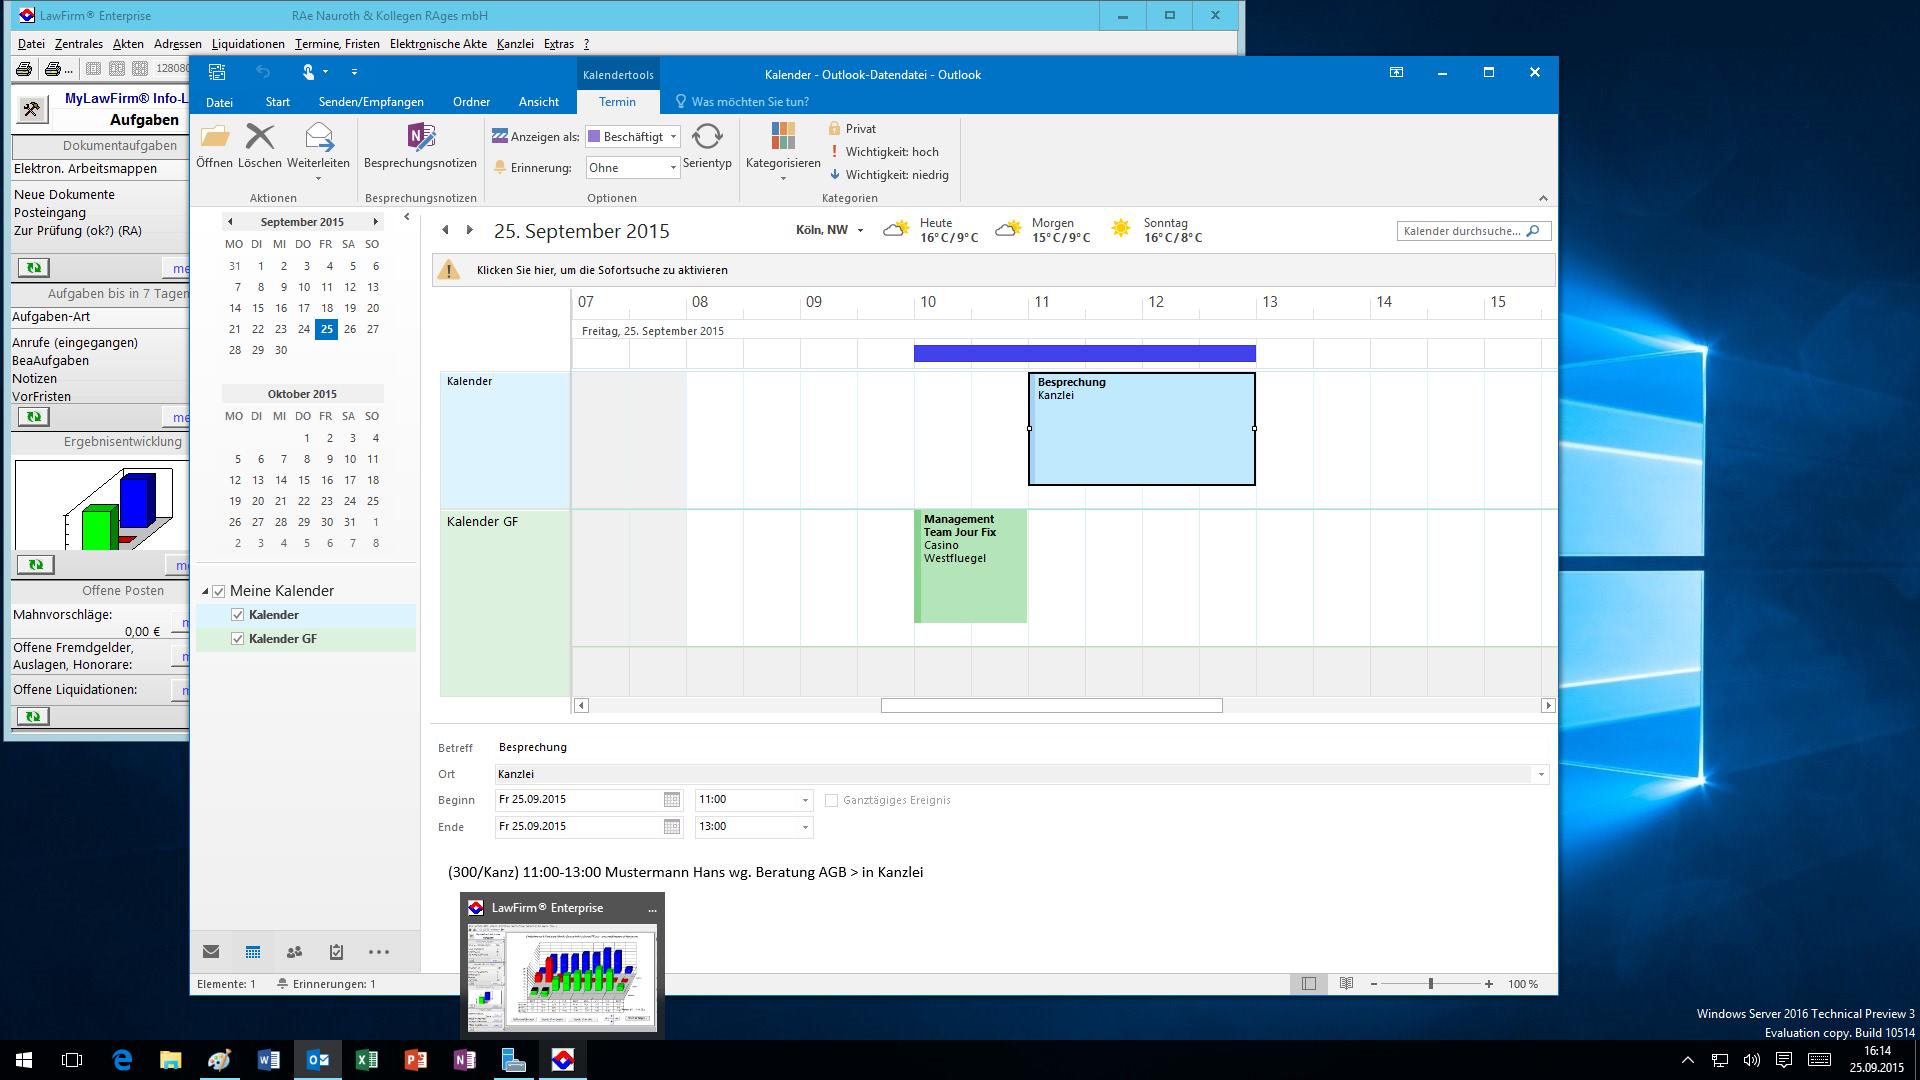 LawFirm® + Outlook 2016: Kalender, Planungsansicht, mehrere Kalender